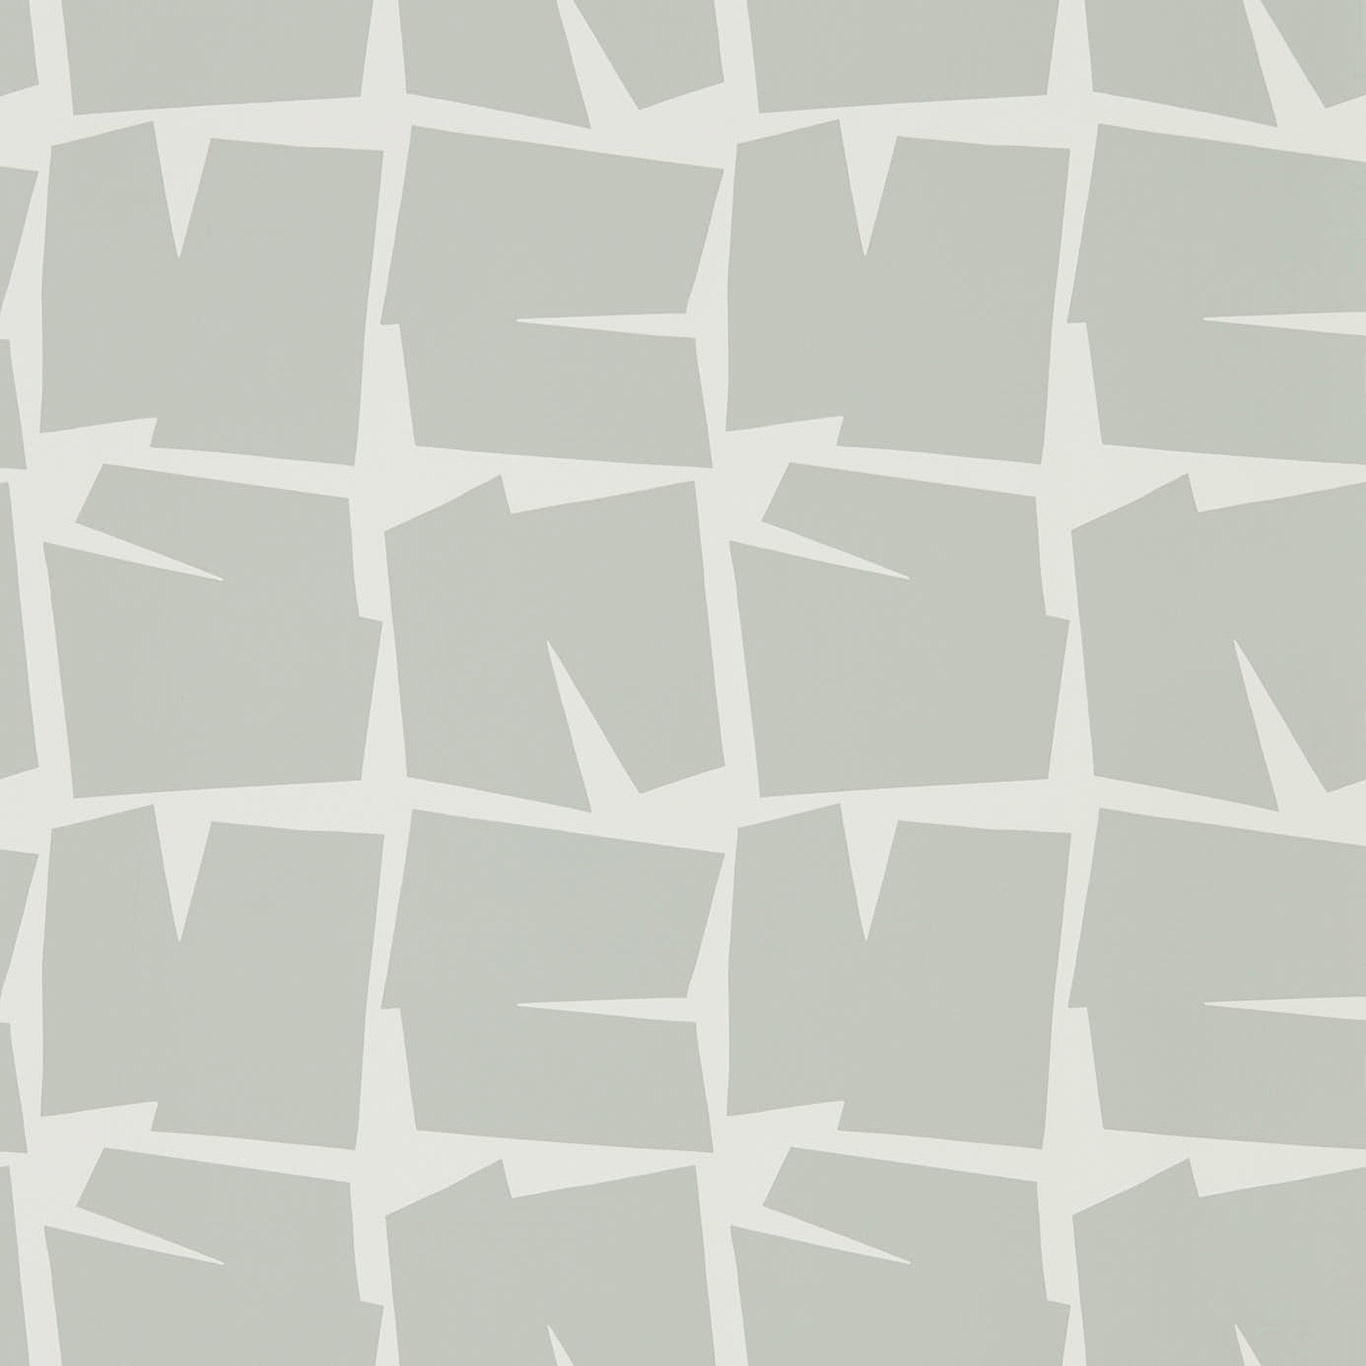 Image of Scion Moqui Steel Wallpaper 111807